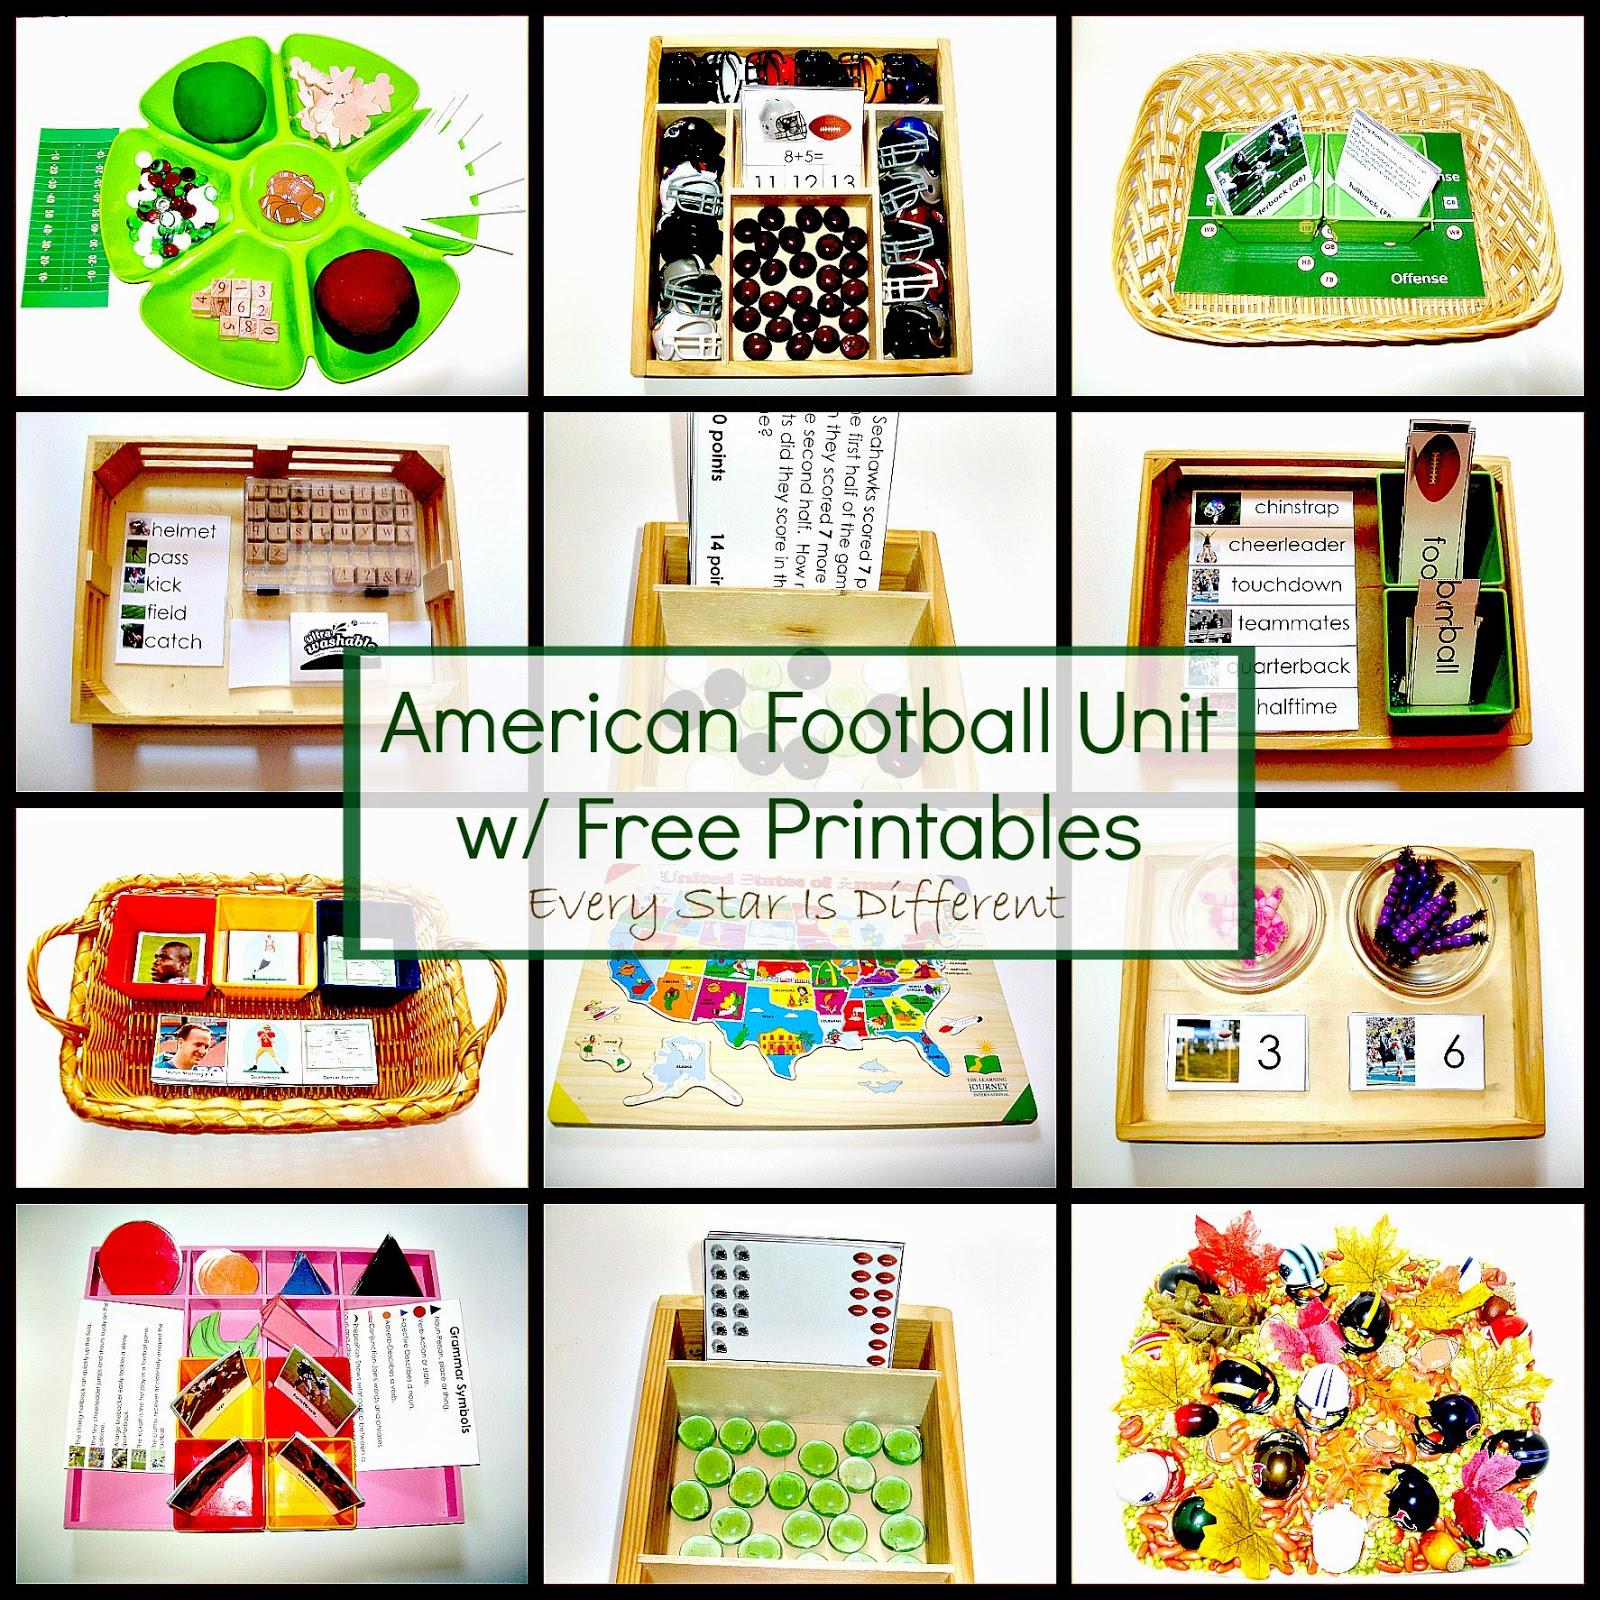 American Football Unit W Free Printables